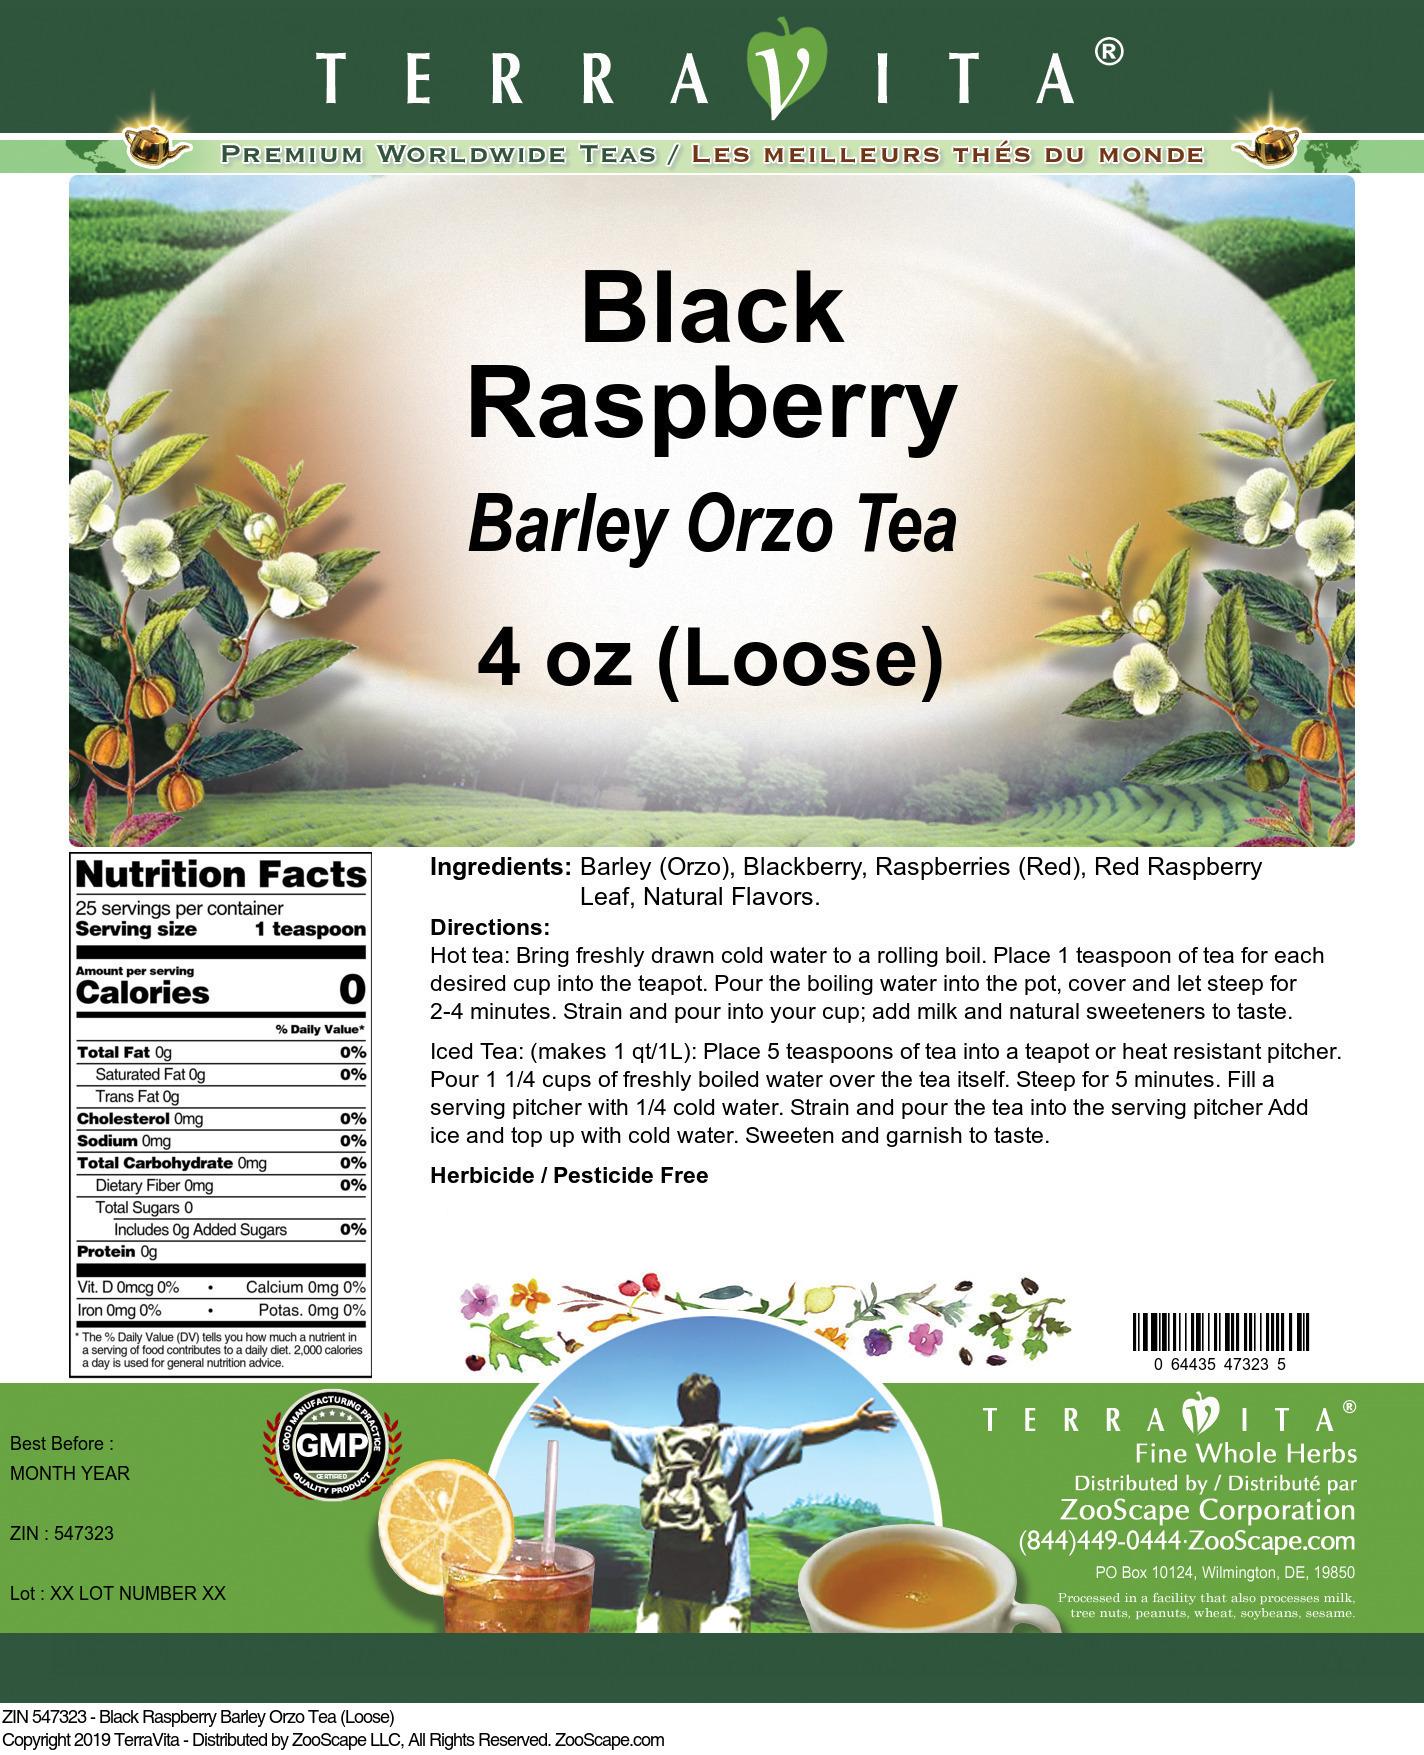 Black Raspberry Barley Orzo